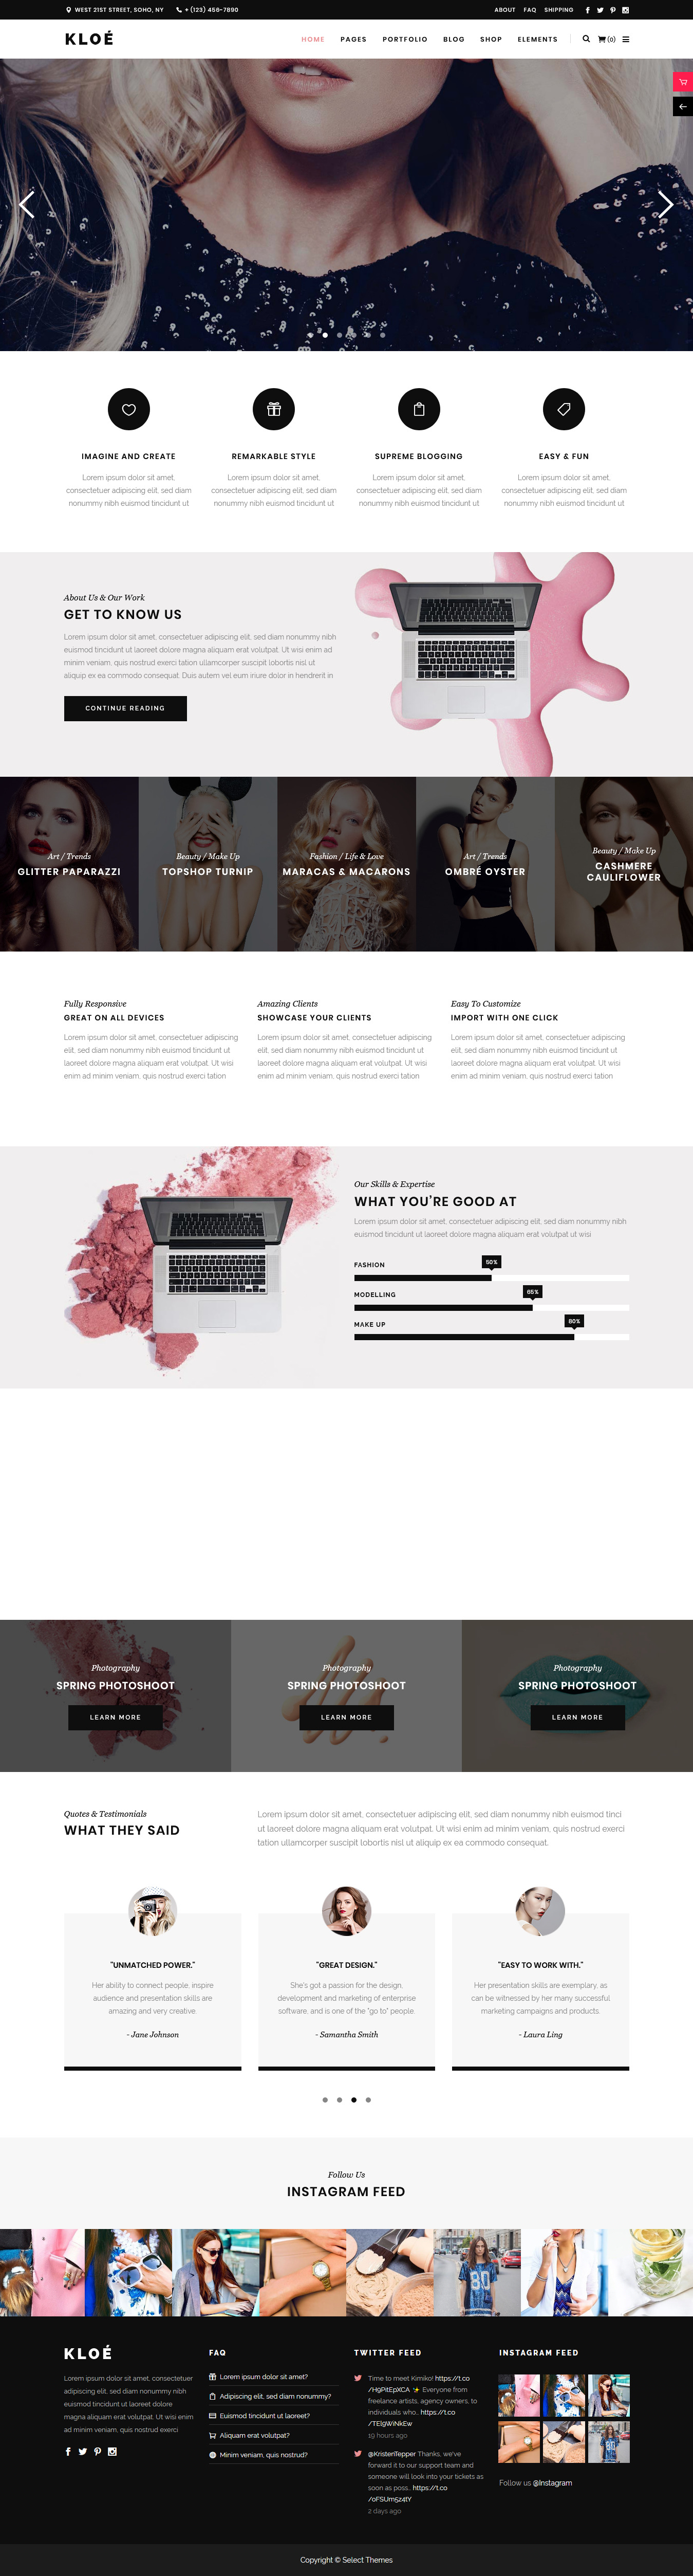 kloe best premium feminine wordpress theme - 10+ Best Feminine WordPress Themes (Premium Version)